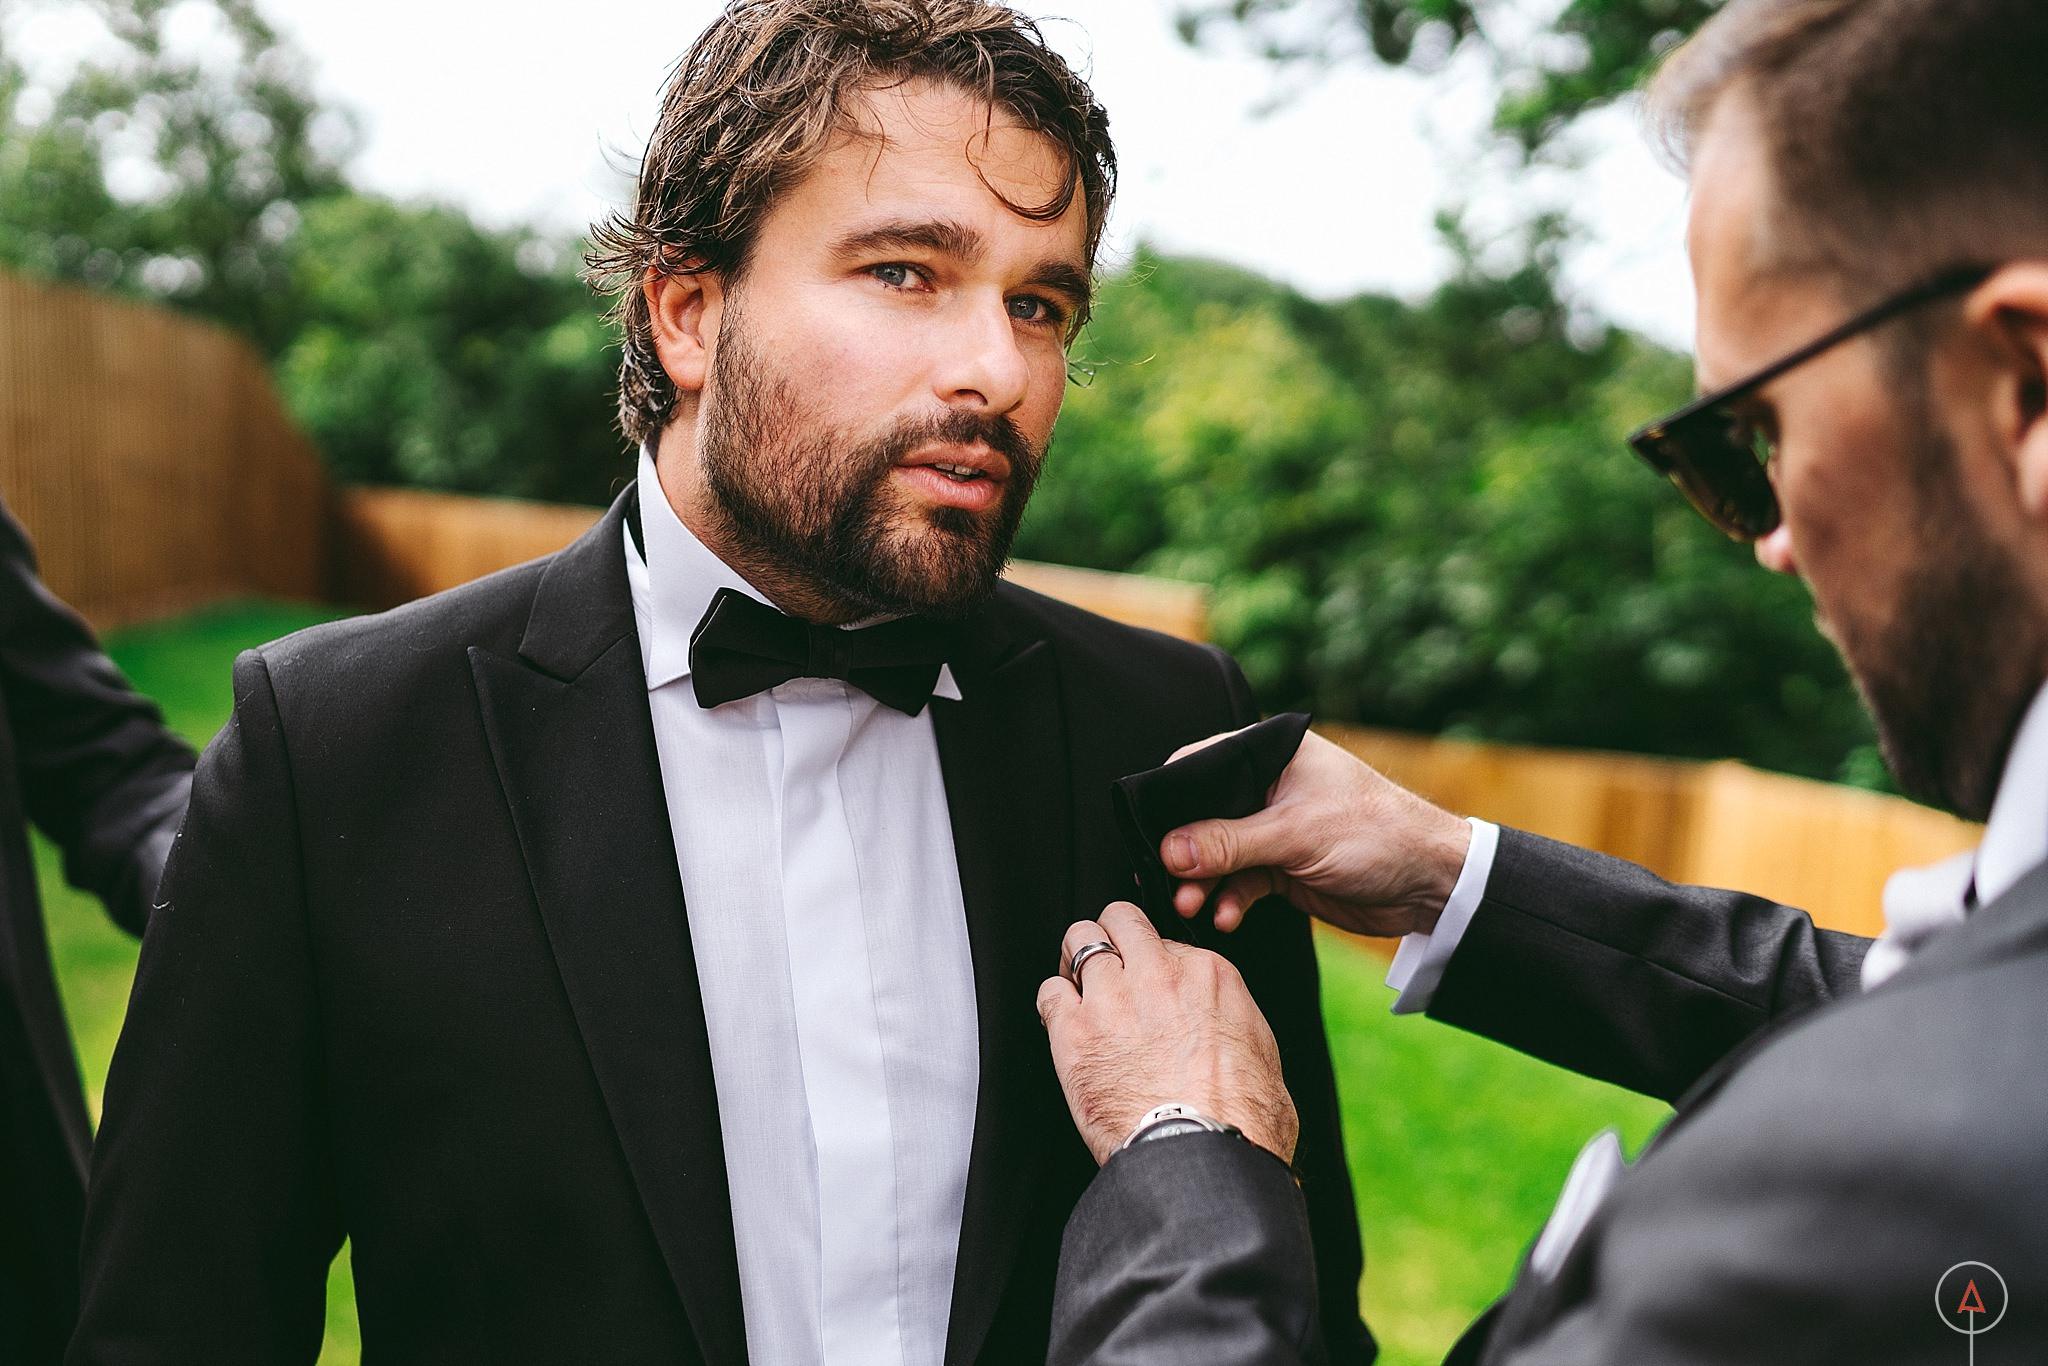 cardiff-wedding-photographer-aga-tomaszek_0347